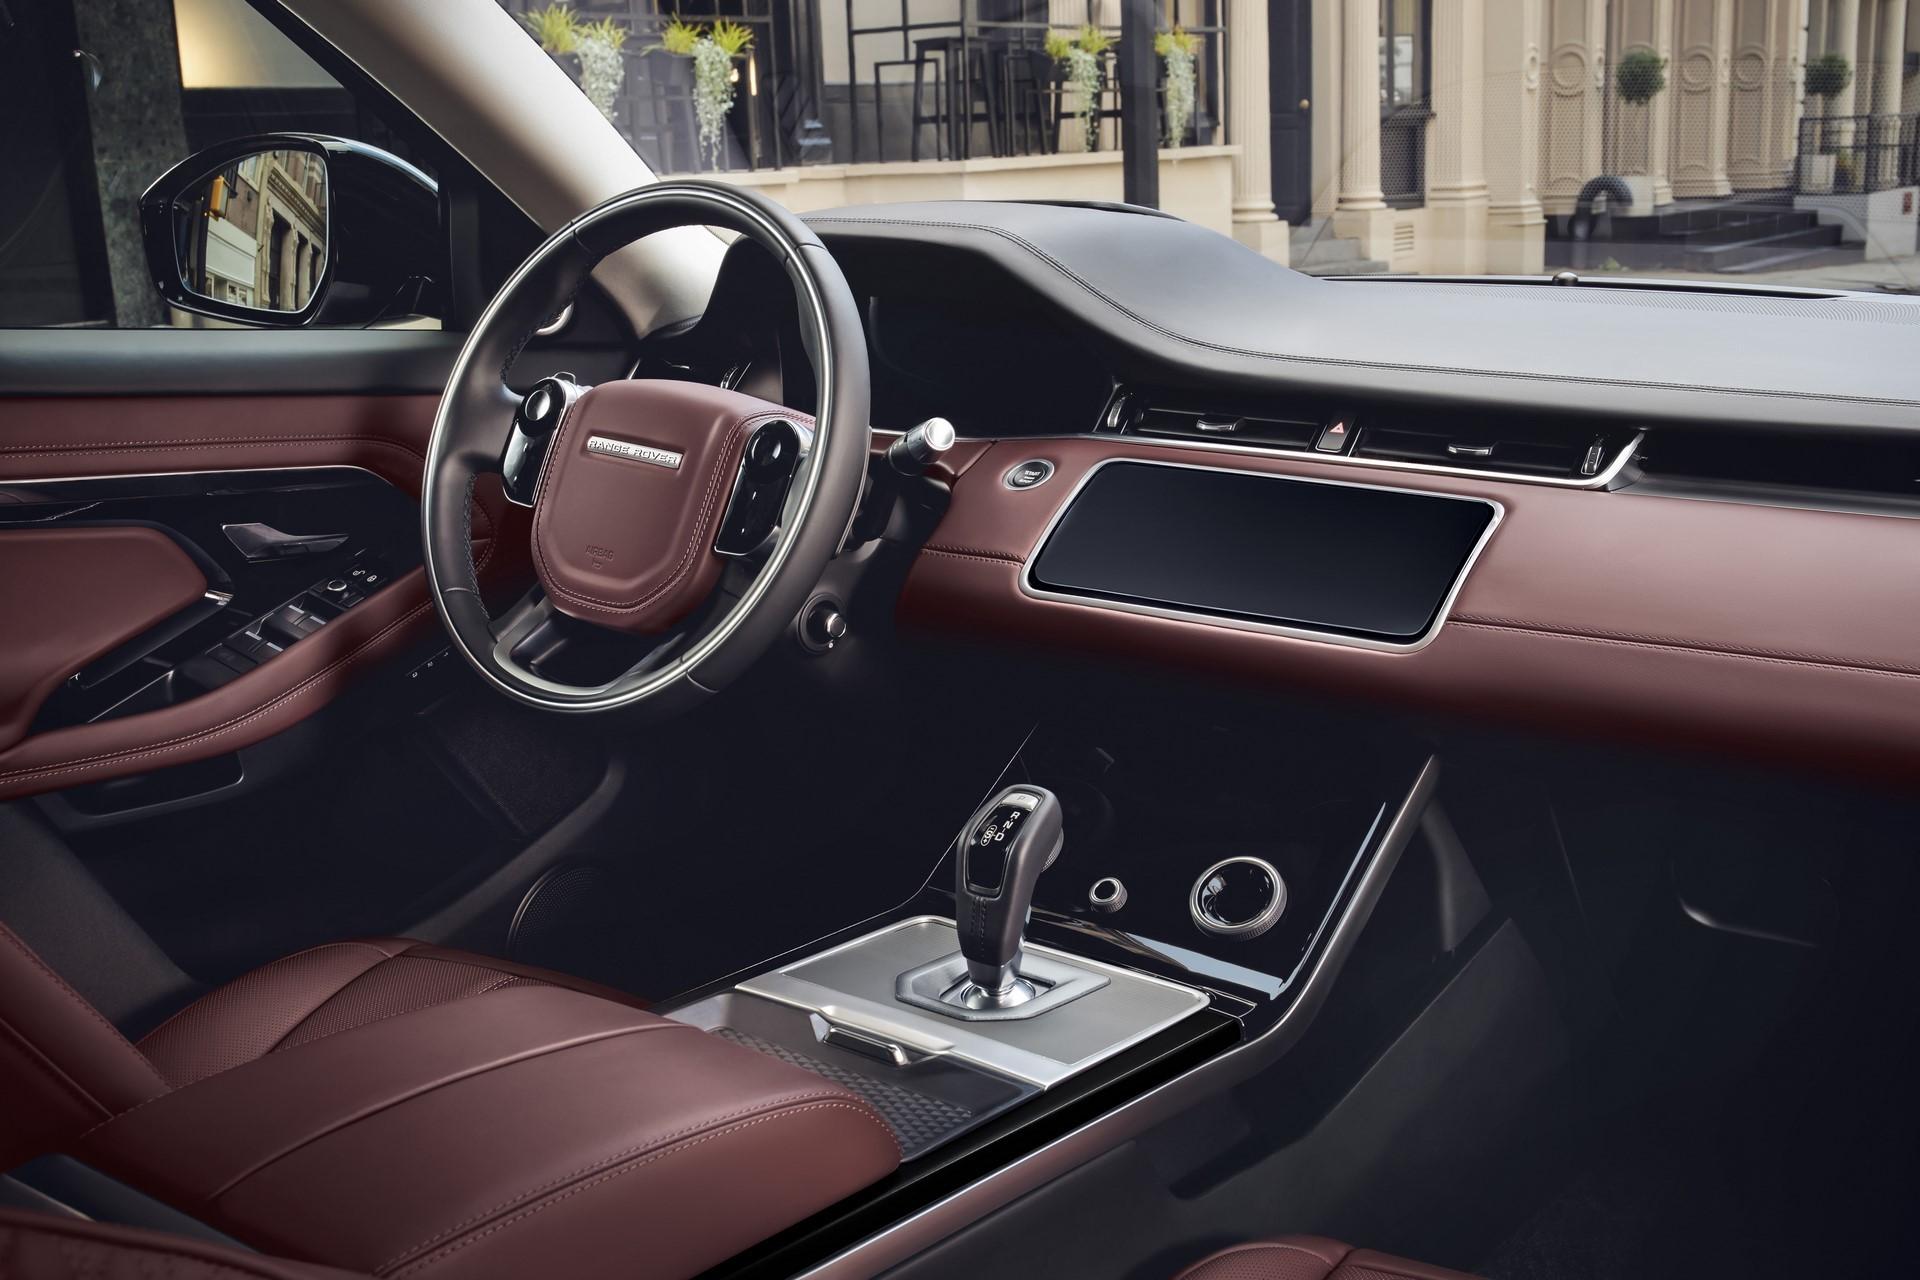 Range Rover Evoque 2019 (61)